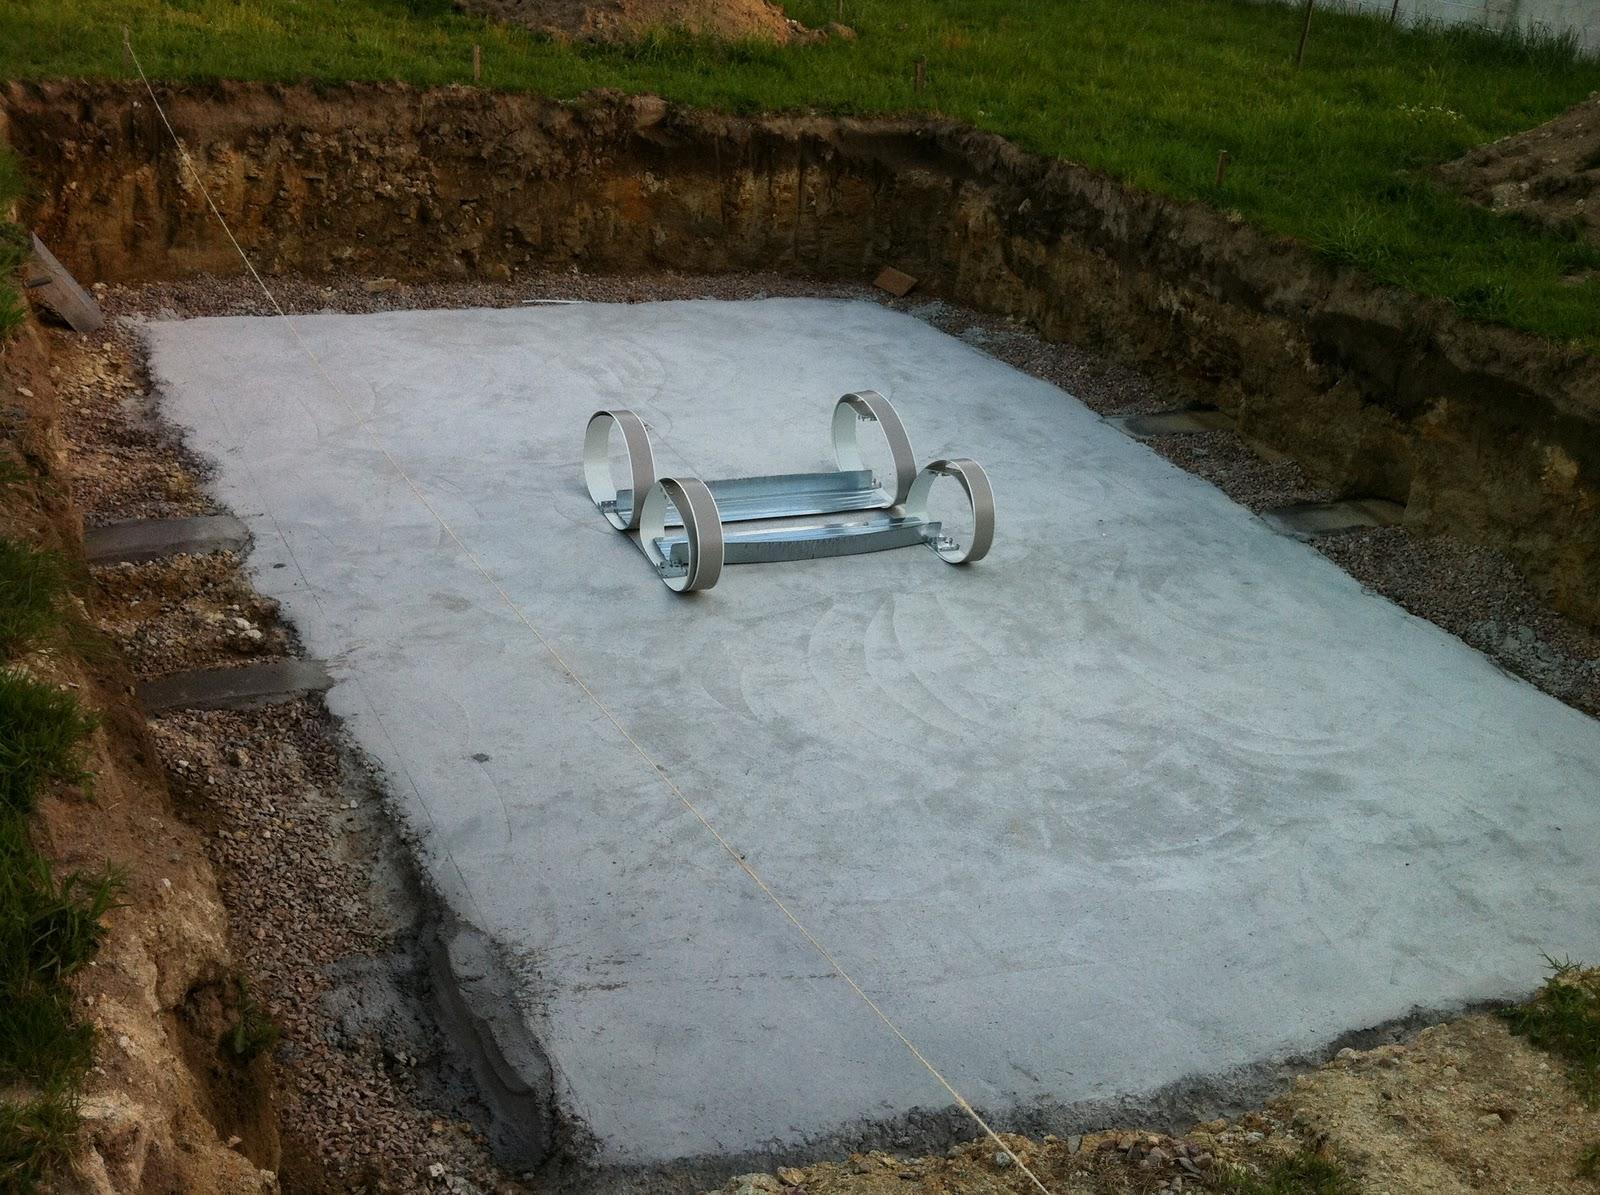 Montaje piscina gre enterrada como montar una piscina gre for Como construir una piscina de bloques paso a paso